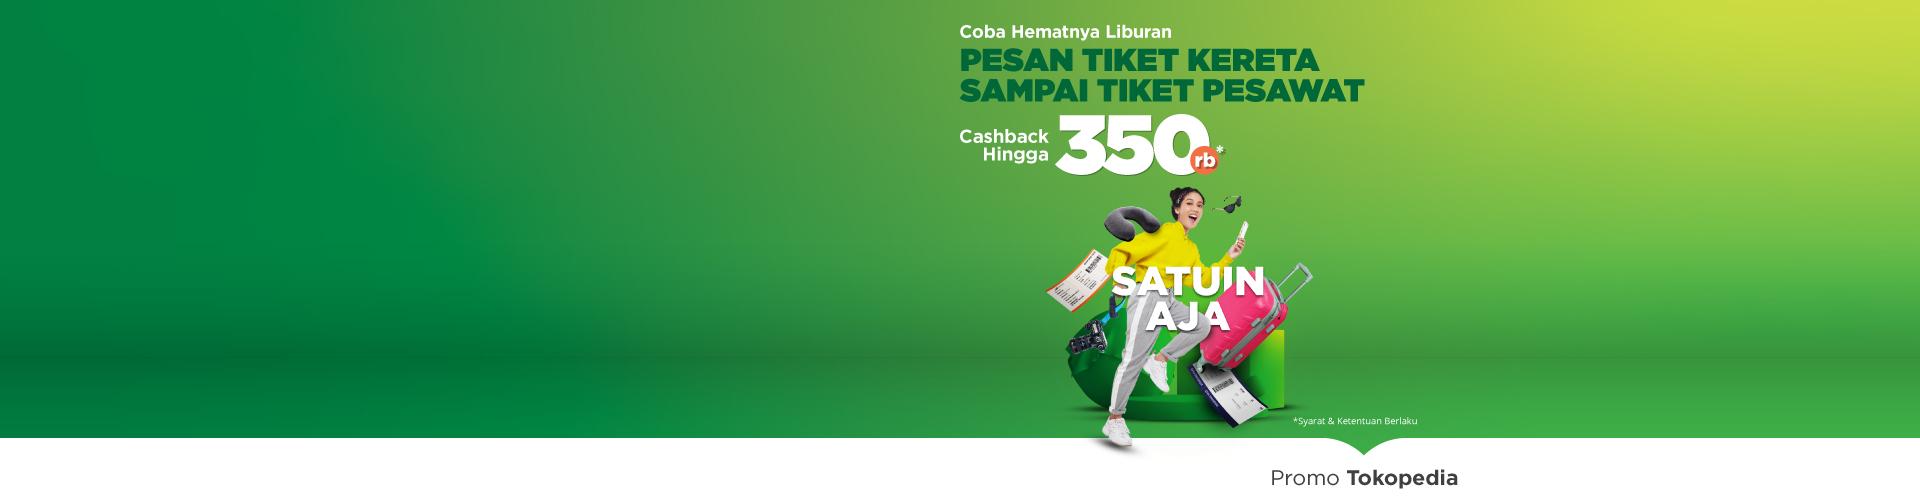 Khusus buat kamu pengguna baru, yuk belu tiket kereta di Tokopedia dan dapatkan cashback sampai 65ribu!